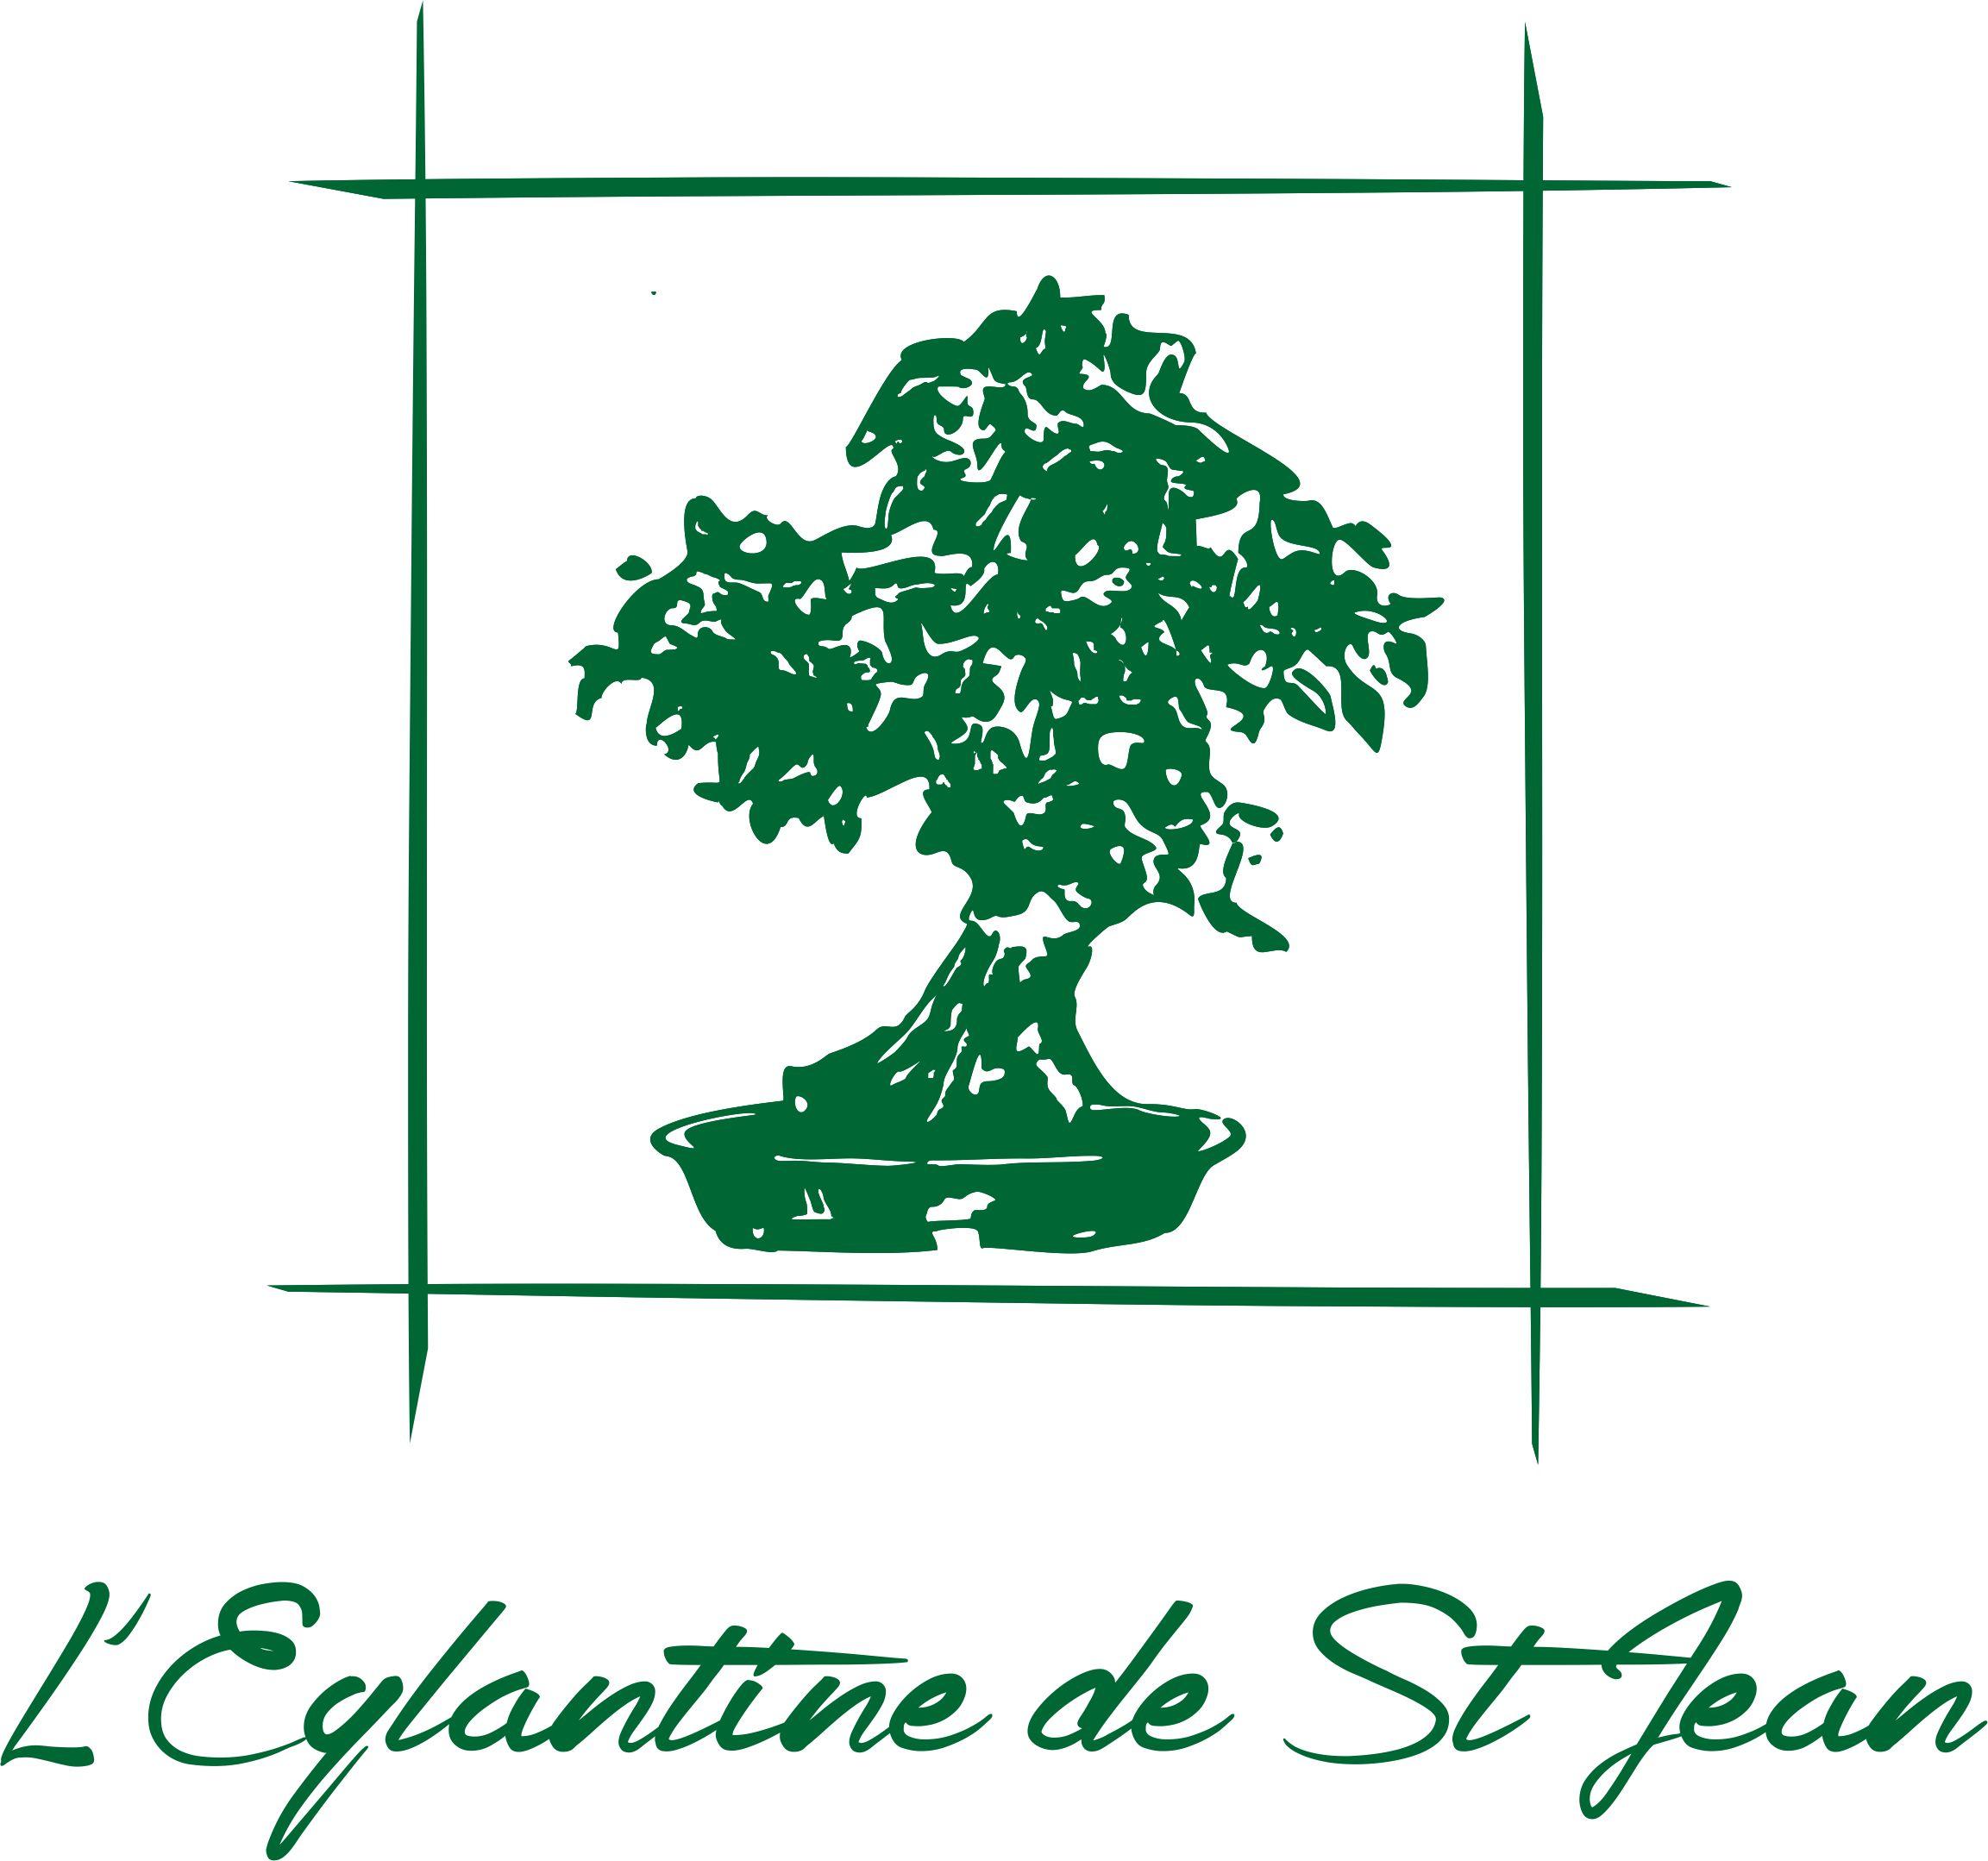 L'Eglantine de Saint Jean